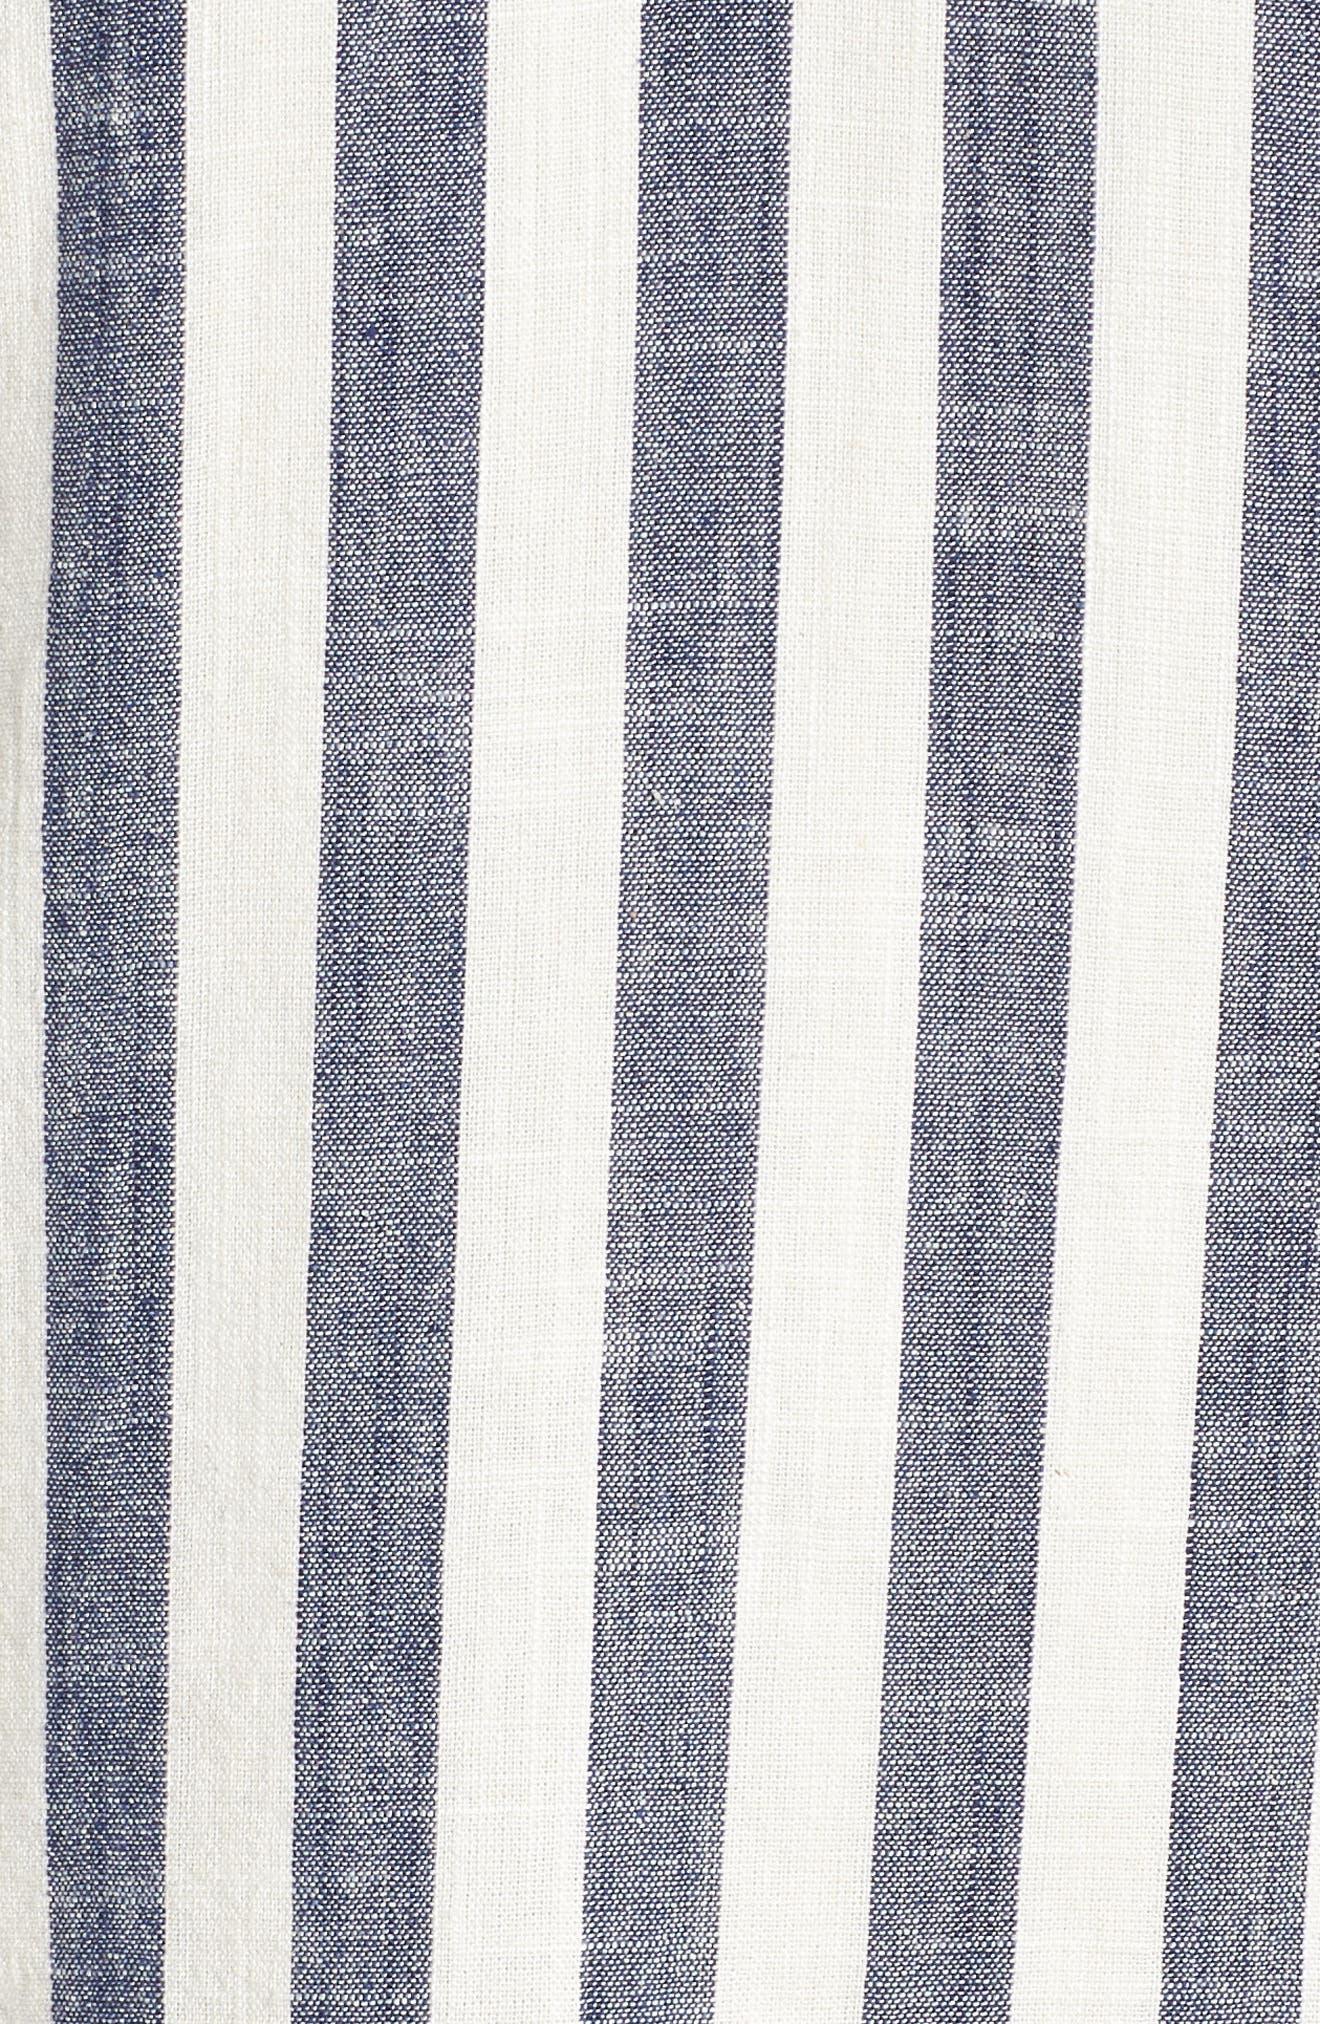 Ruffle Sleeve Shift Dress,                             Alternate thumbnail 6, color,                             Navy-White